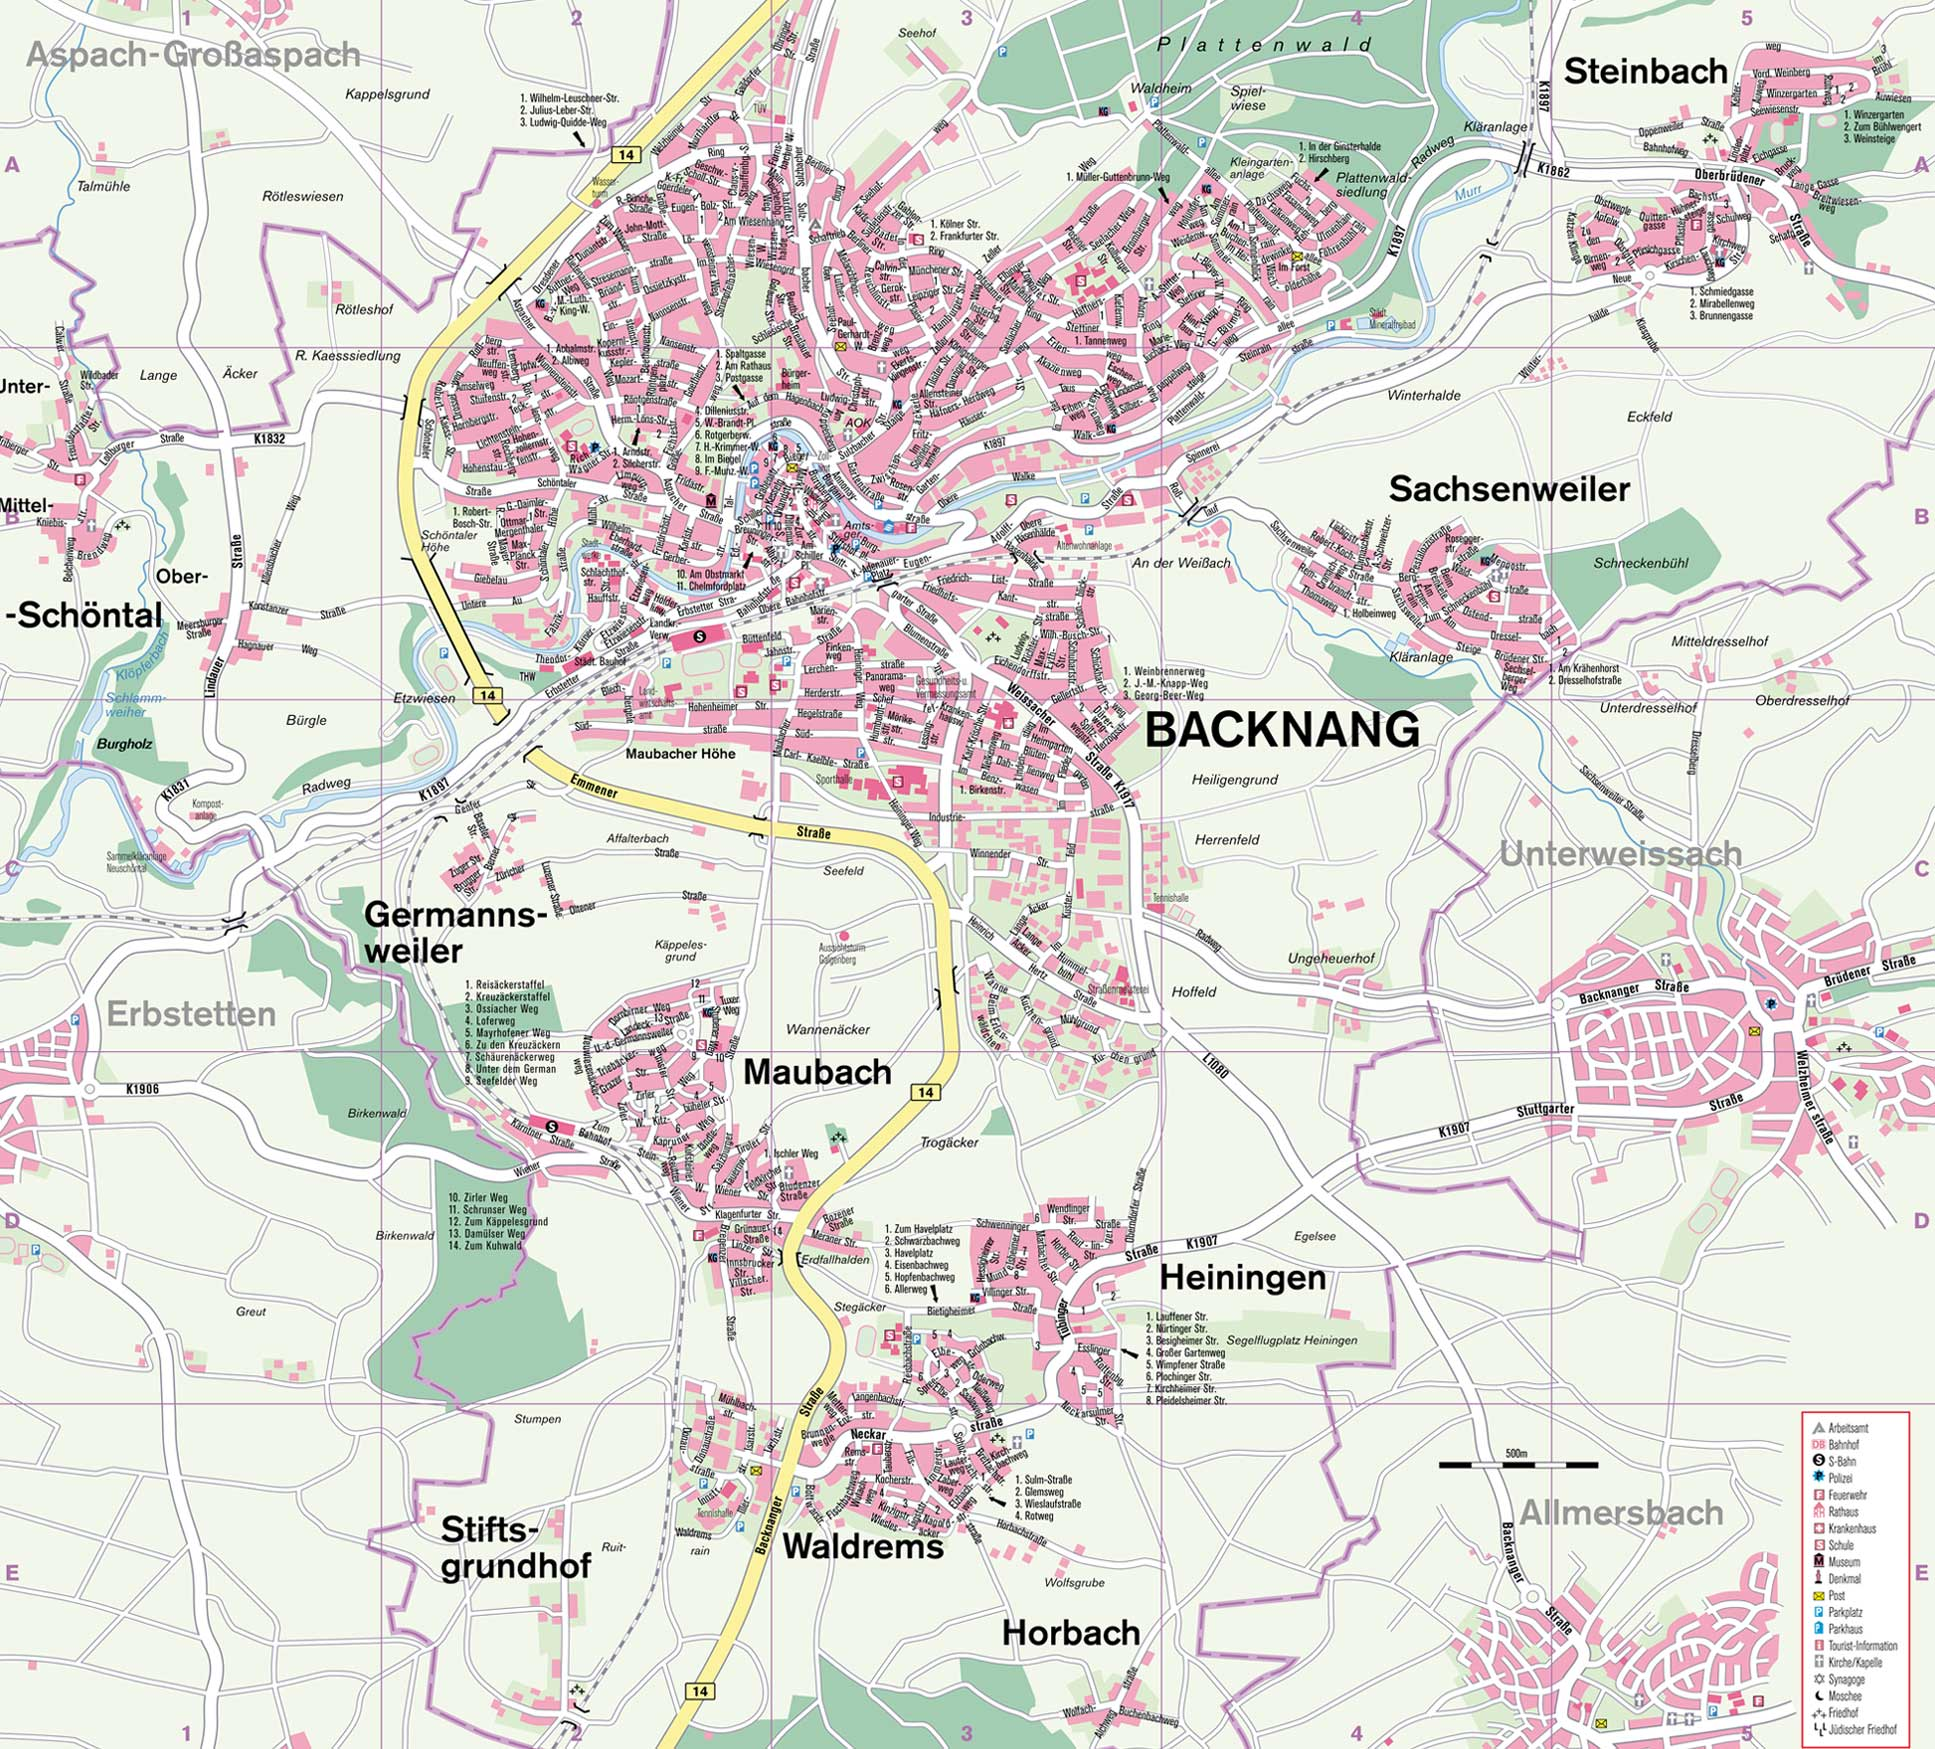 Backnang Germany  city photo : Backnang Region Map Backnang Germany • mappery